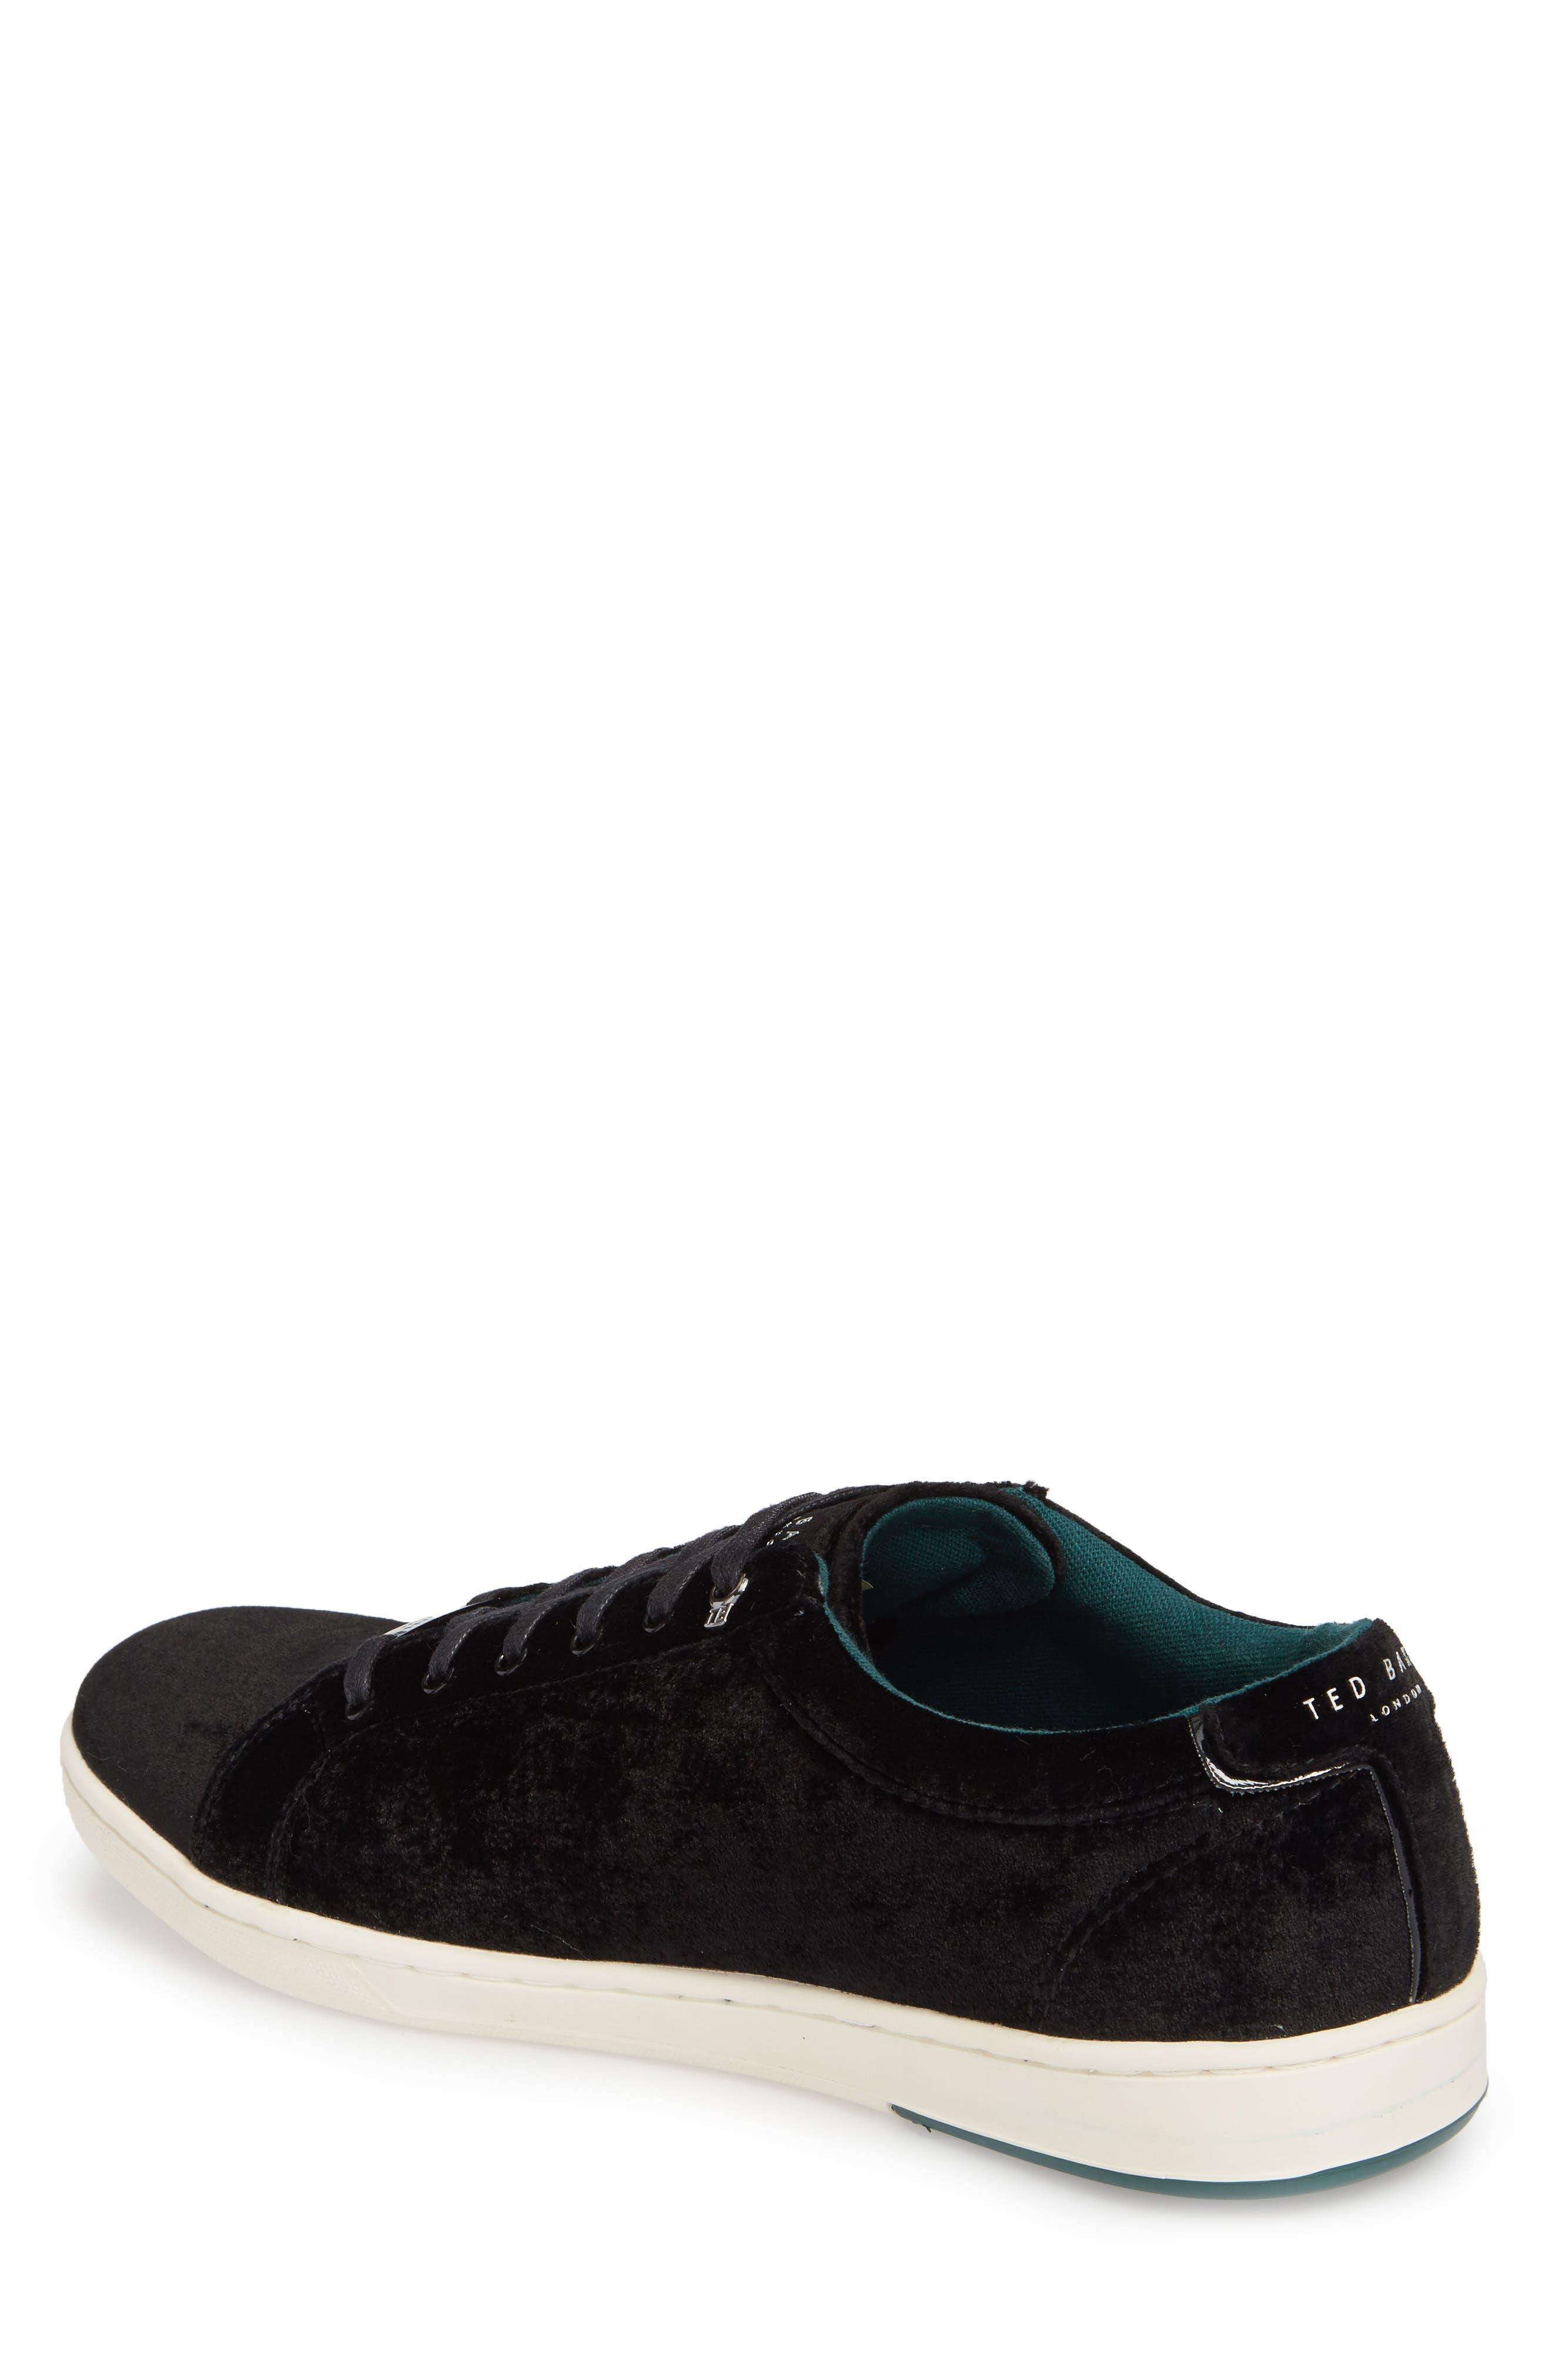 Lambrt Sneaker,                             Alternate thumbnail 2, color,                             Black